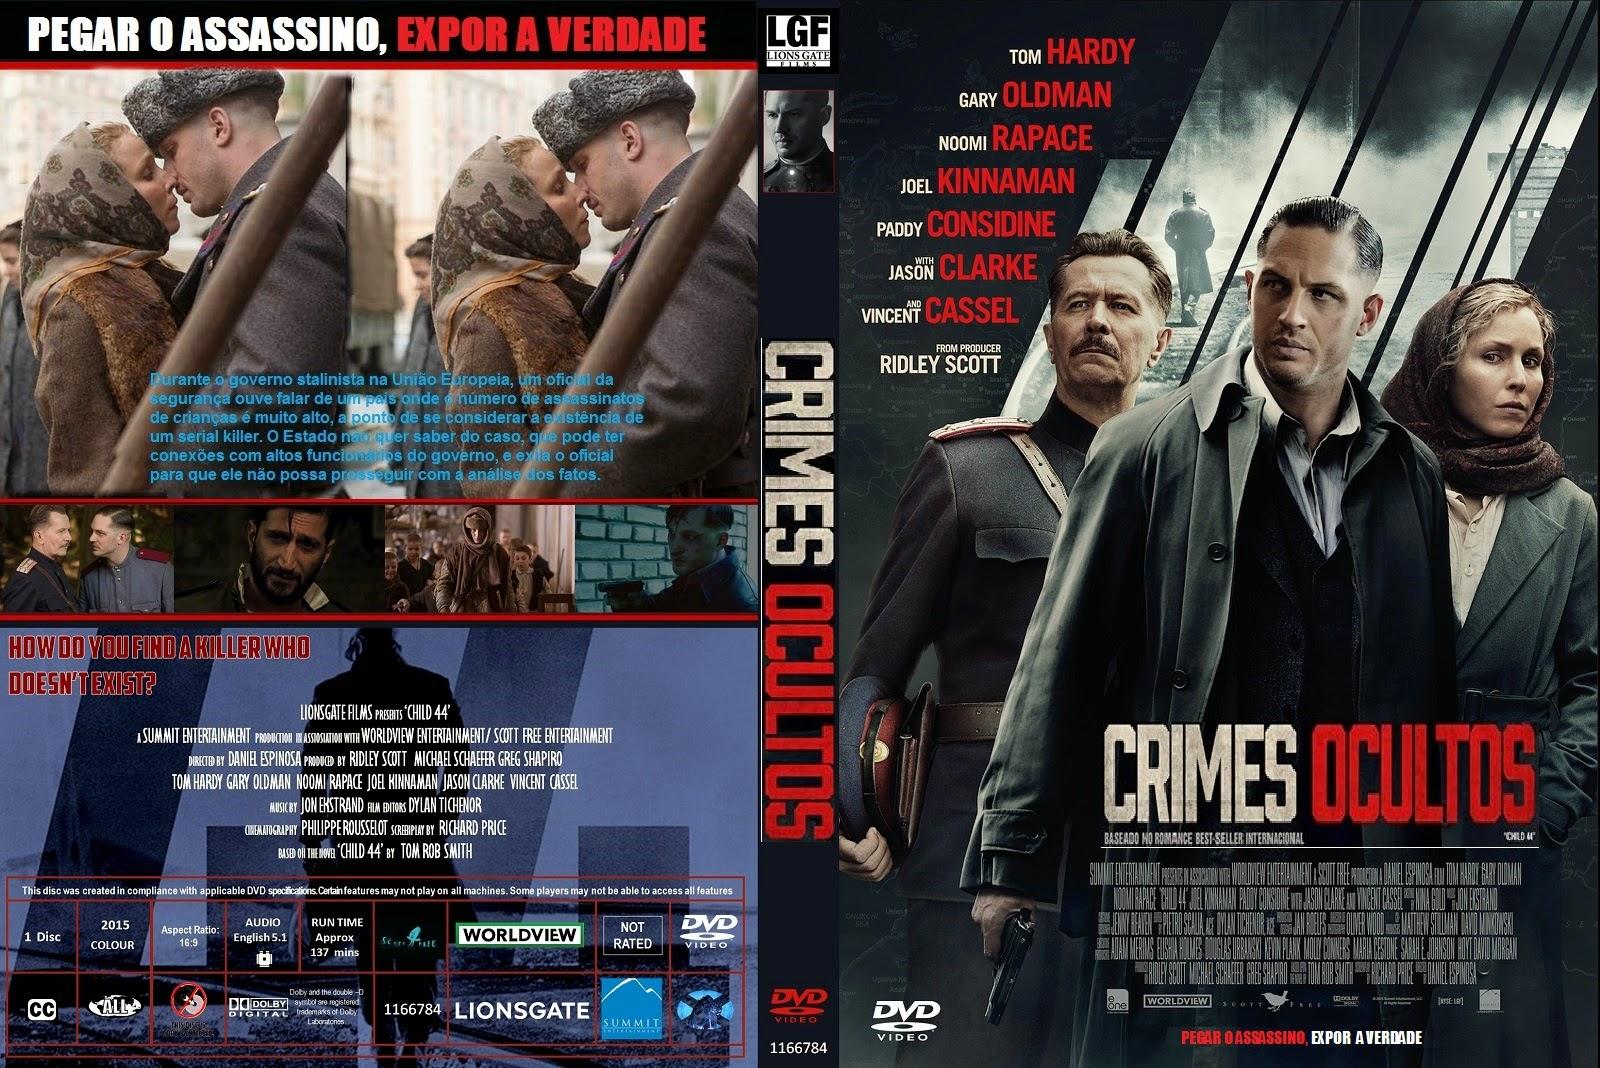 Download Crimes Ocultos DVD-R Crimes 2BOcultos 2Bcap 2B1